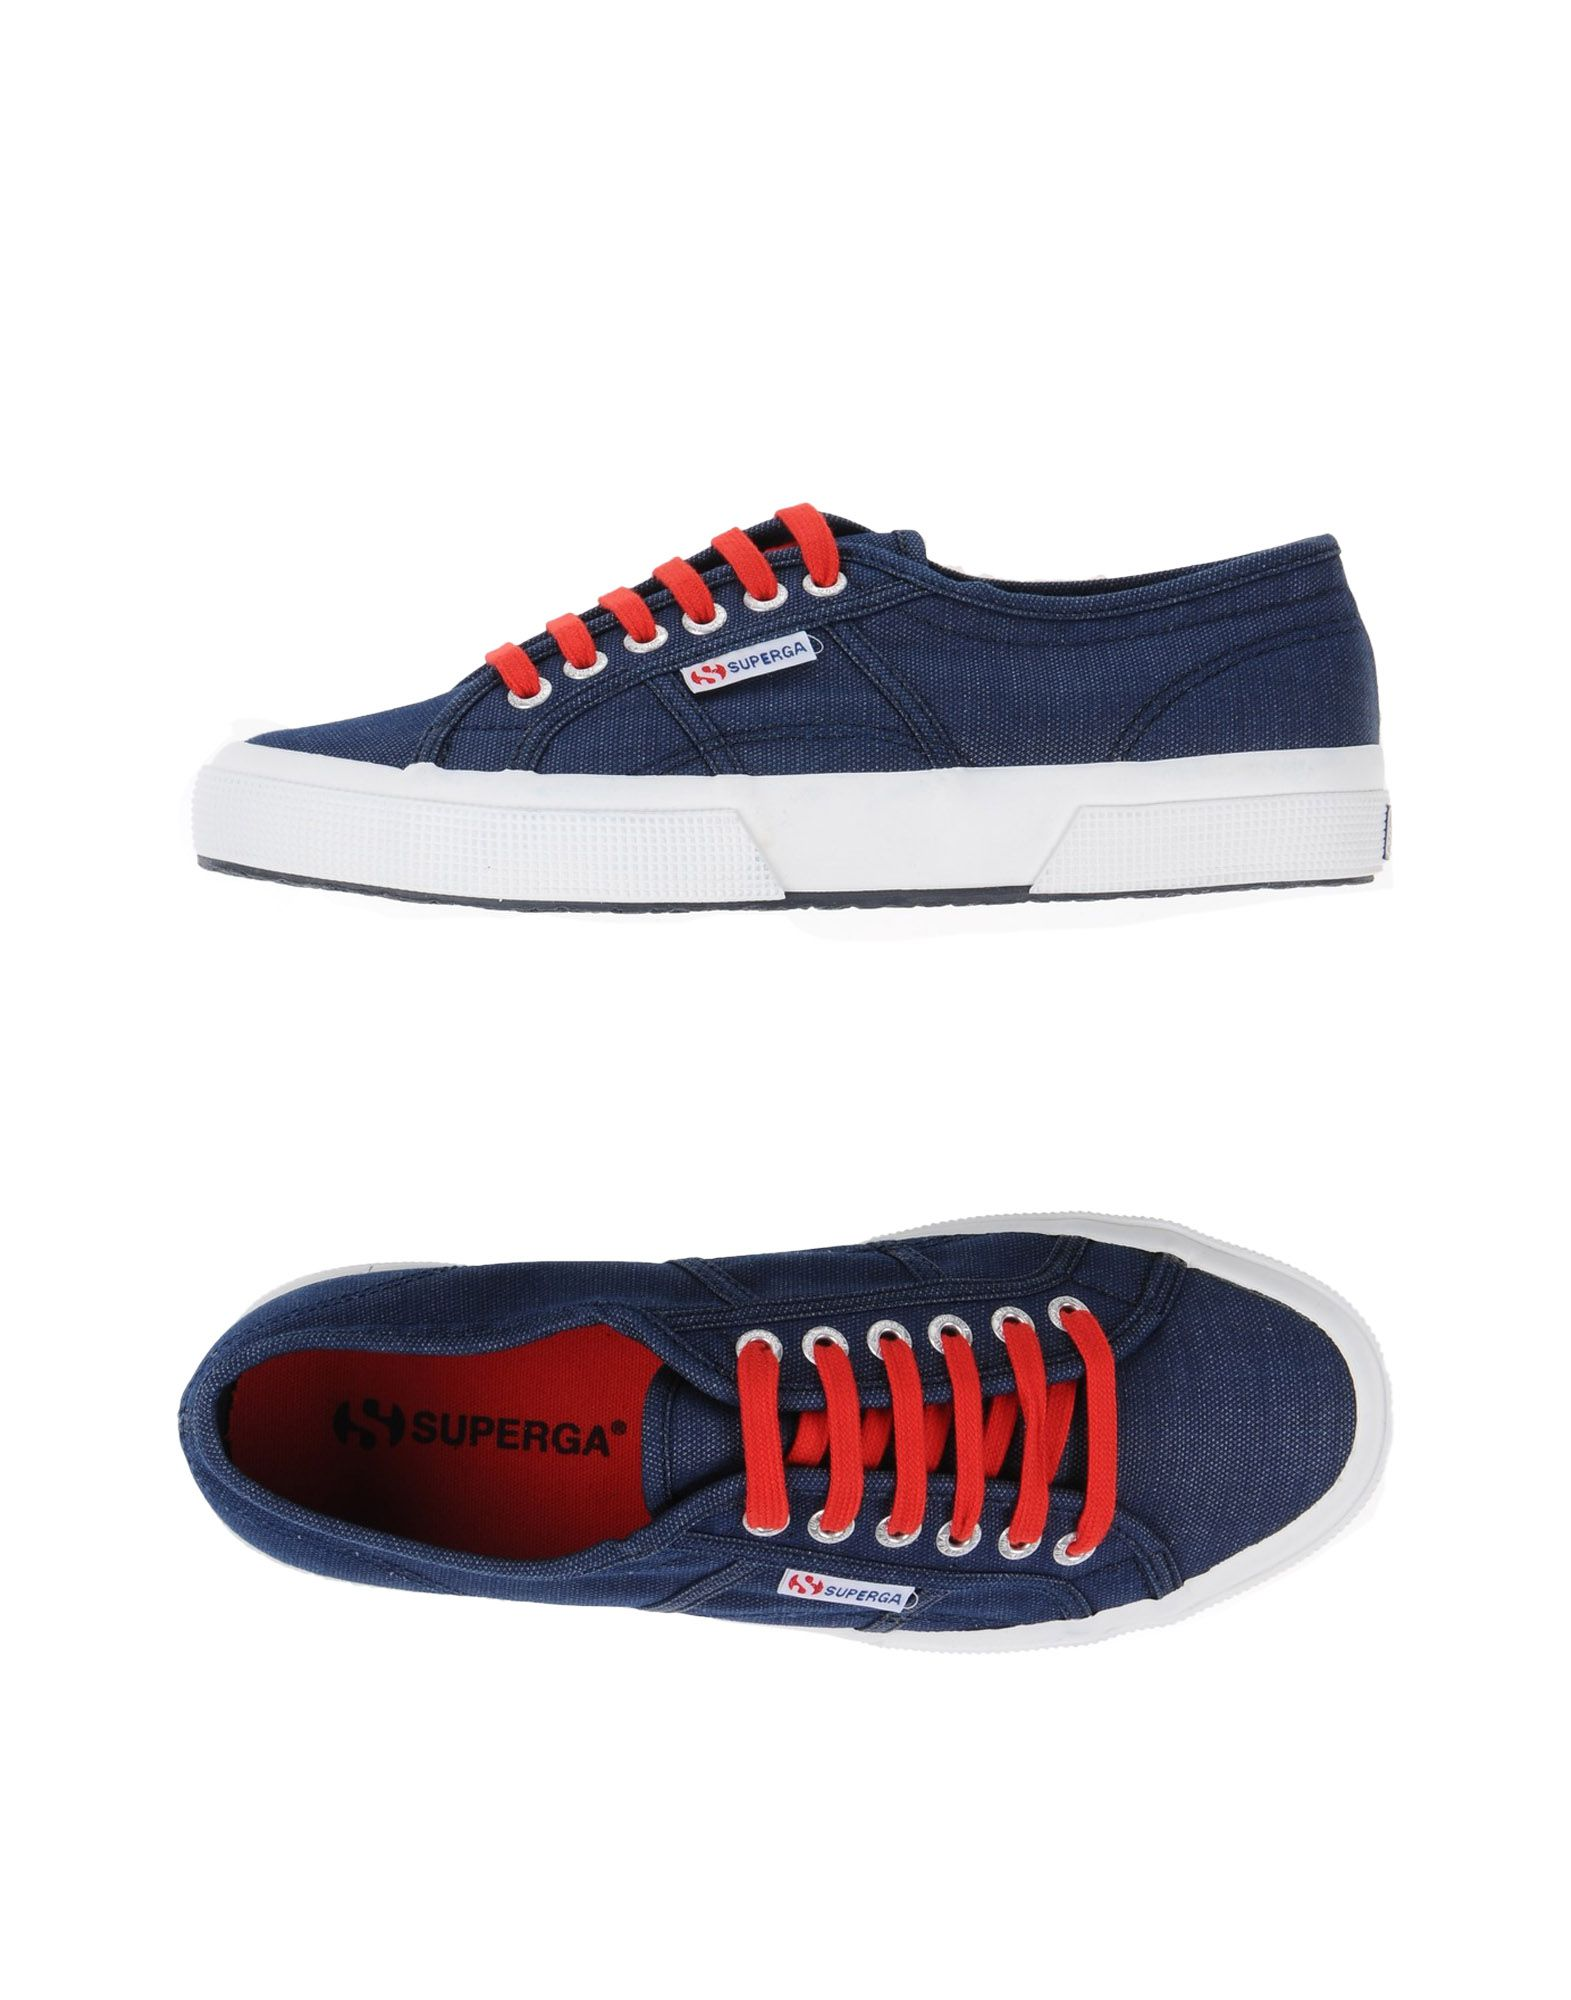 11206272RV Superga® Sneakers Herren  11206272RV  Heiße Schuhe 6ae487